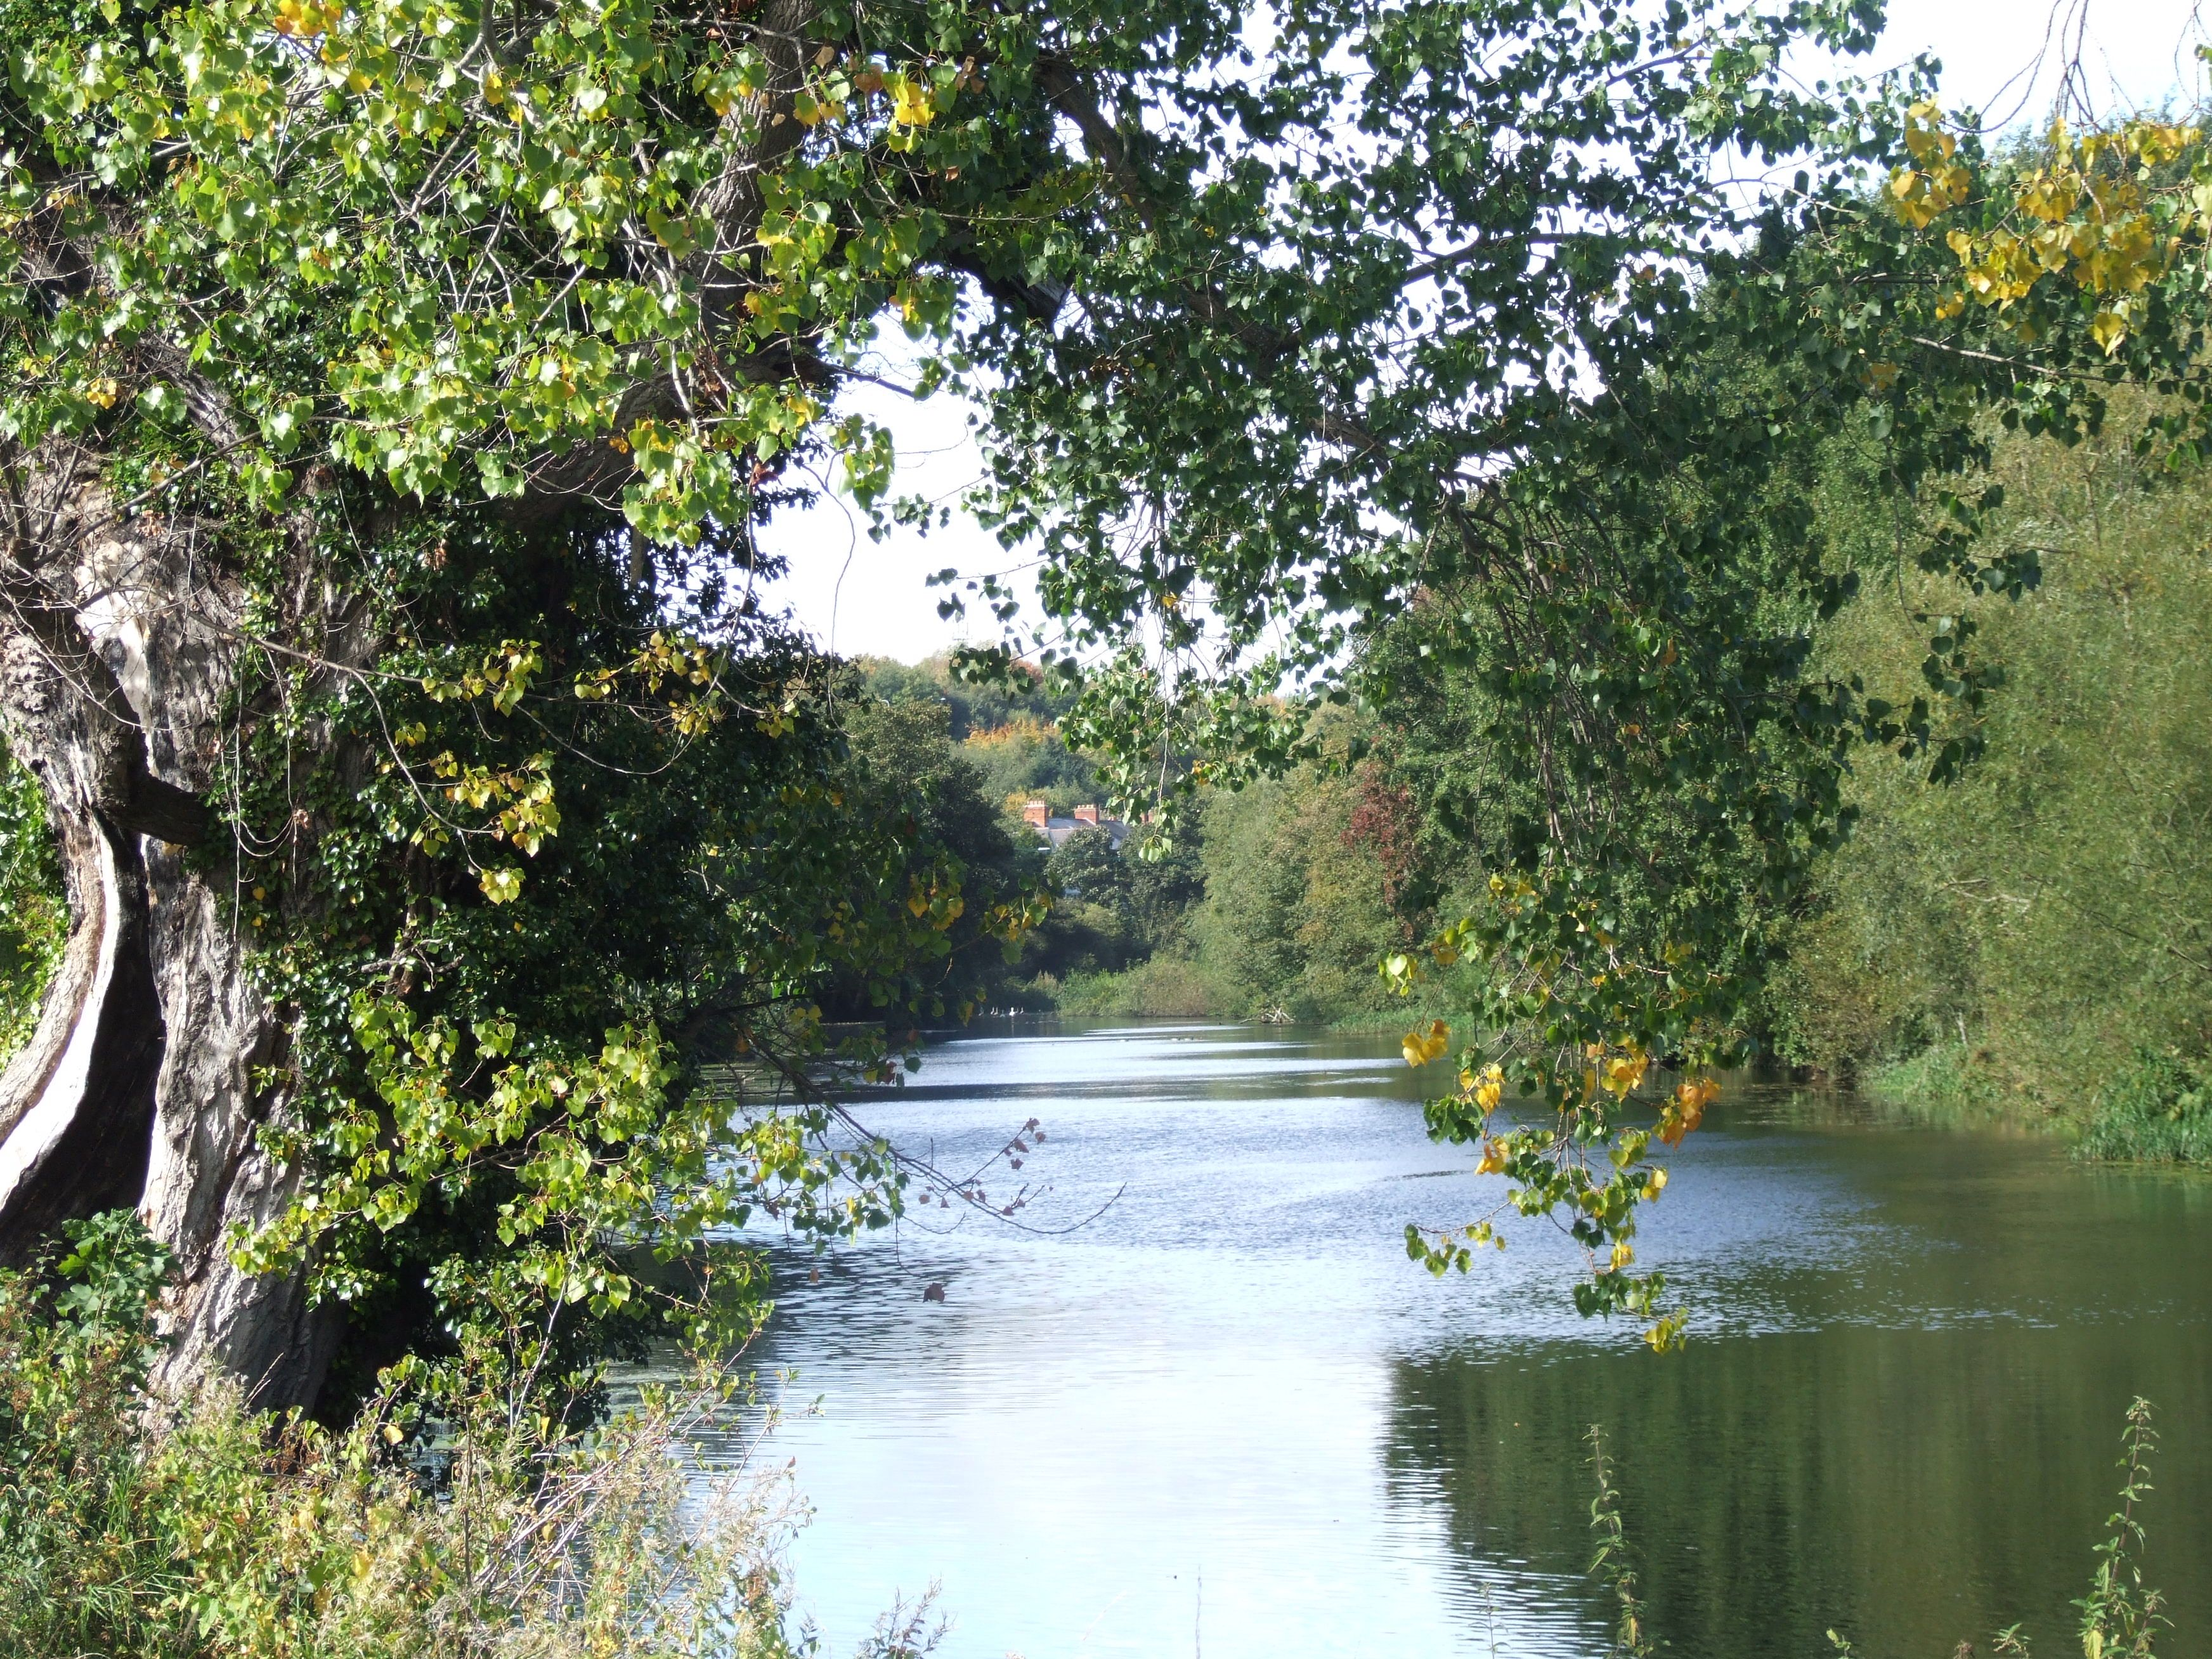 River Liffey at Islandbridge, Dublin